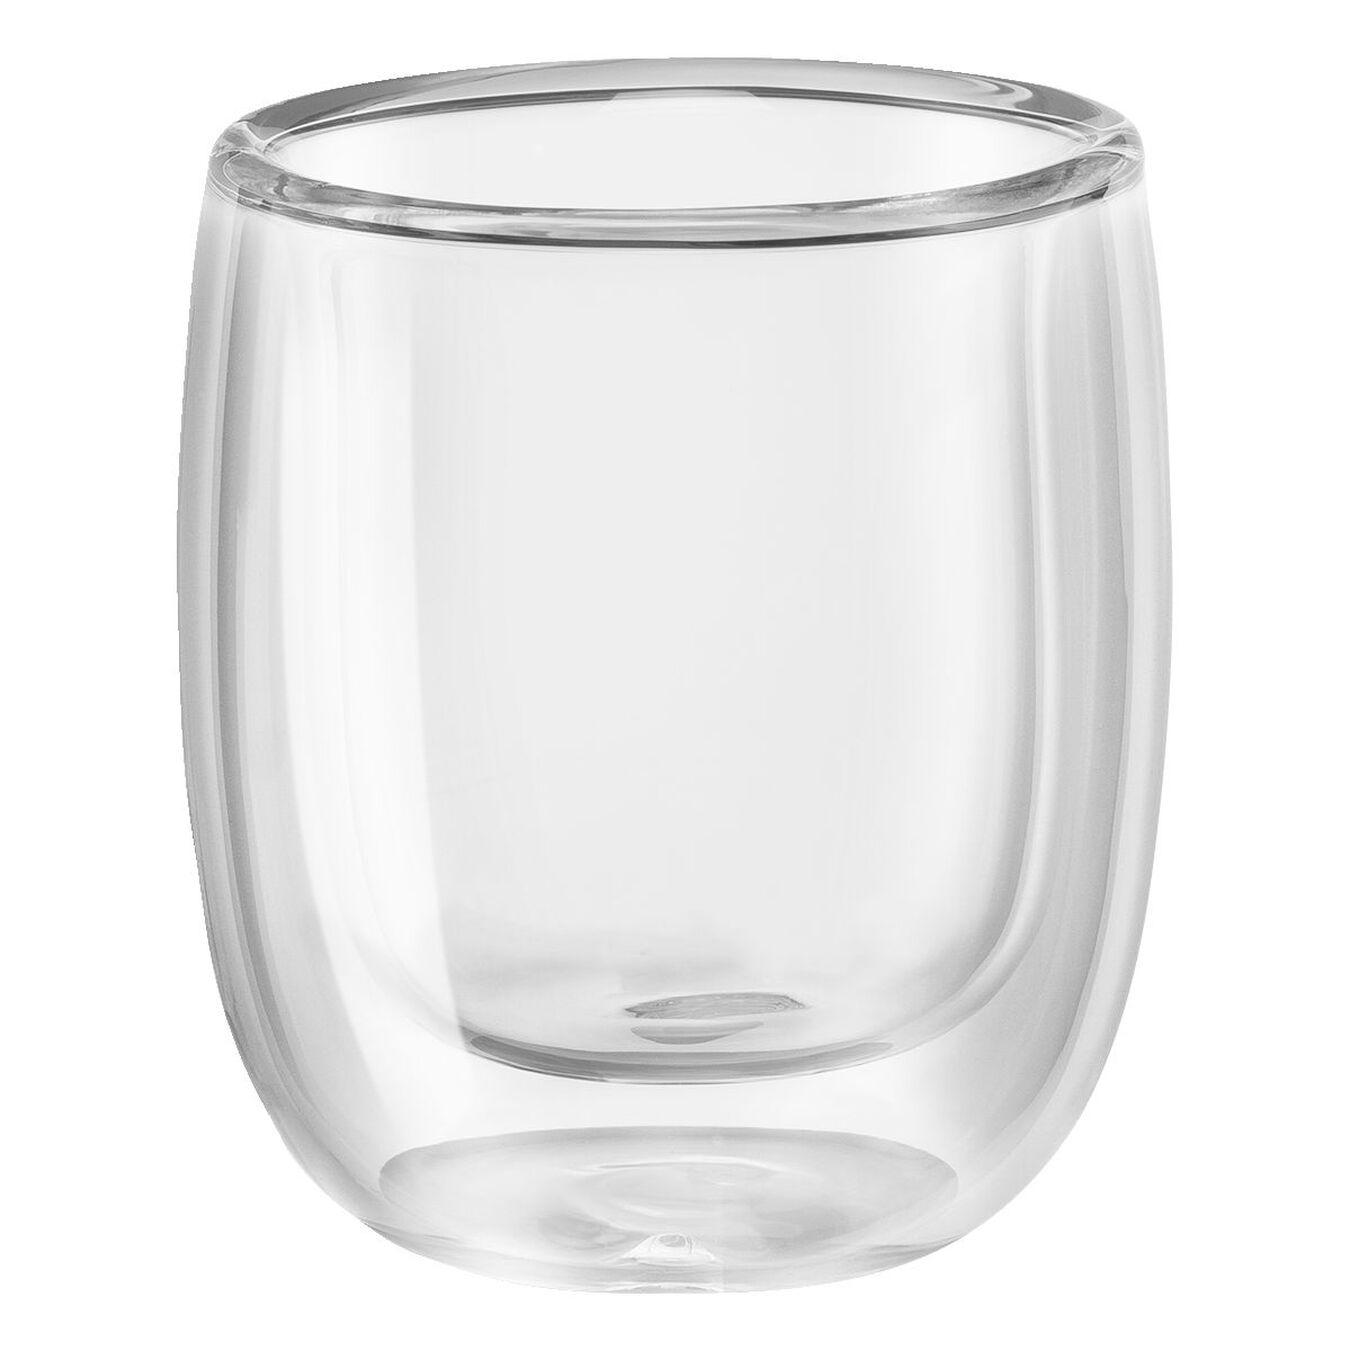 Espresso Bardağı Seti   Borosilikat Cam   2-parça,,large 5